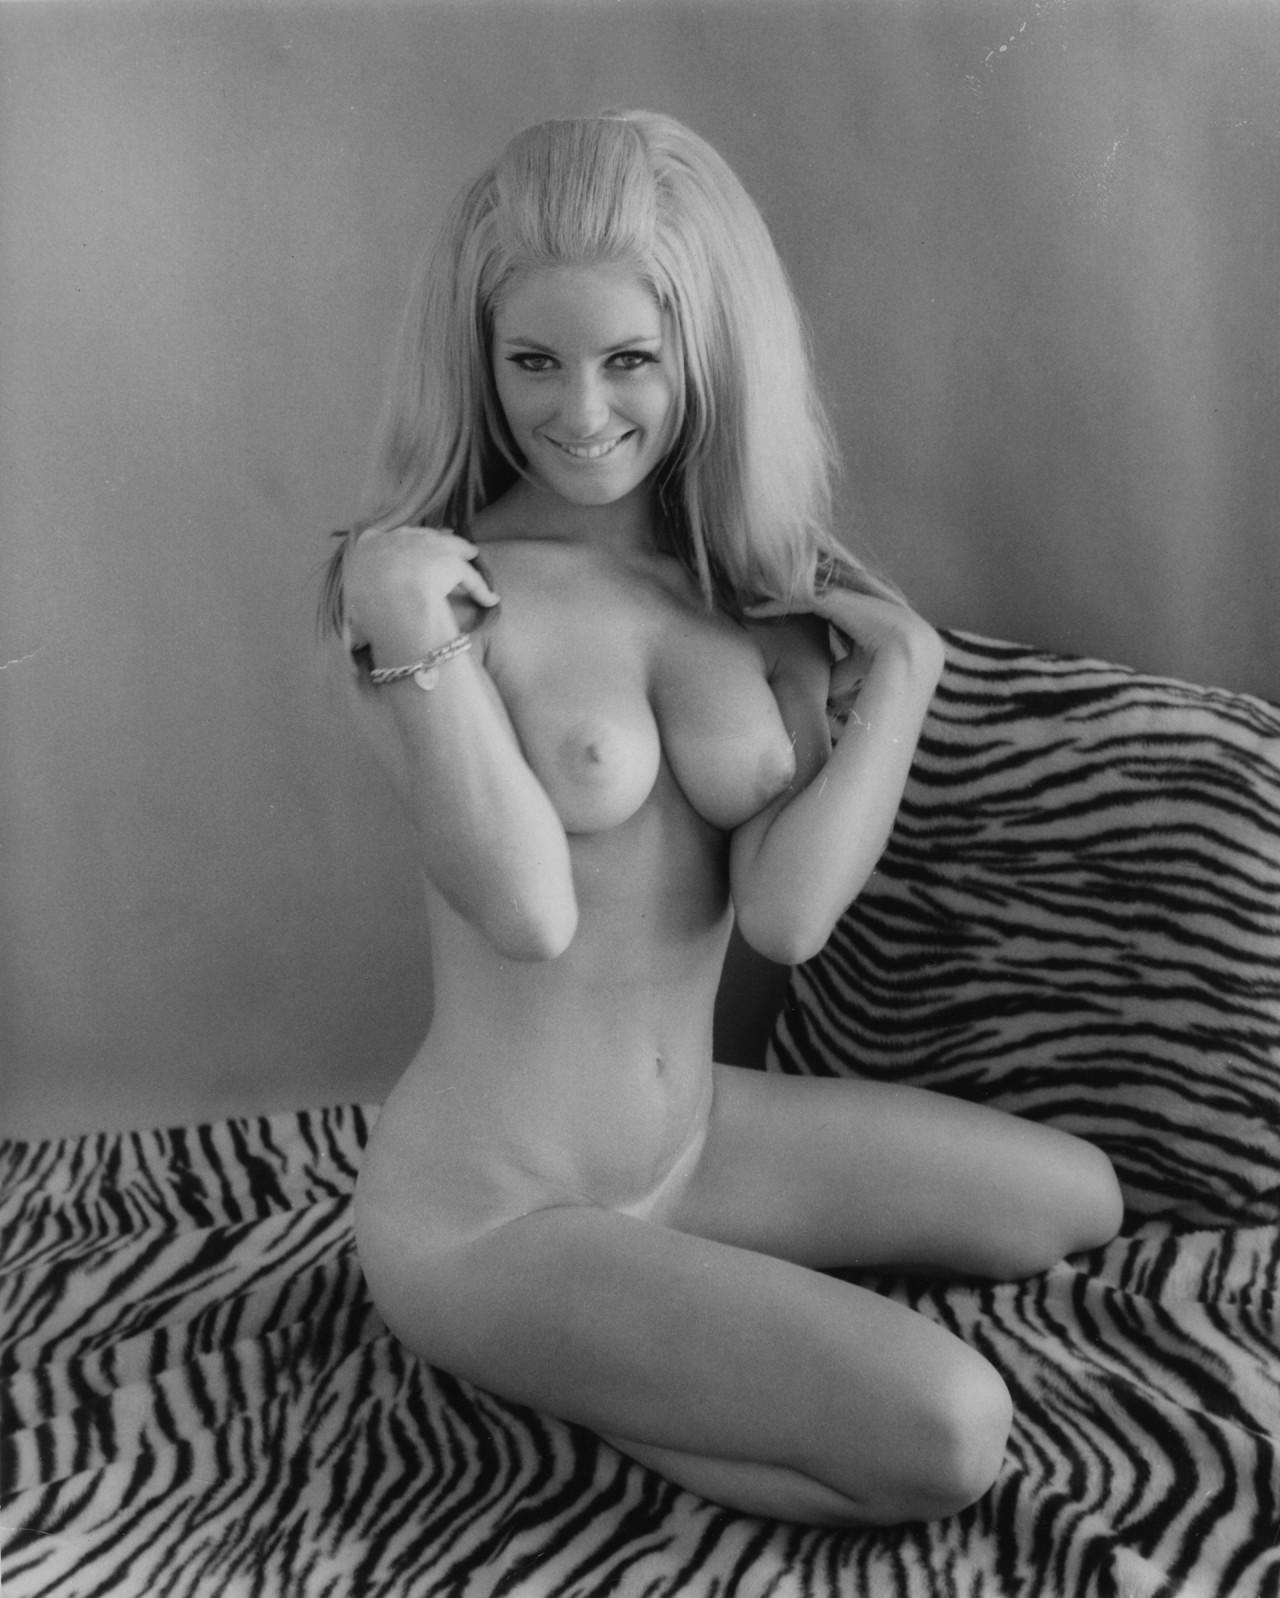 Динни Саттон, 1960-е. Банни Йеджер (7)